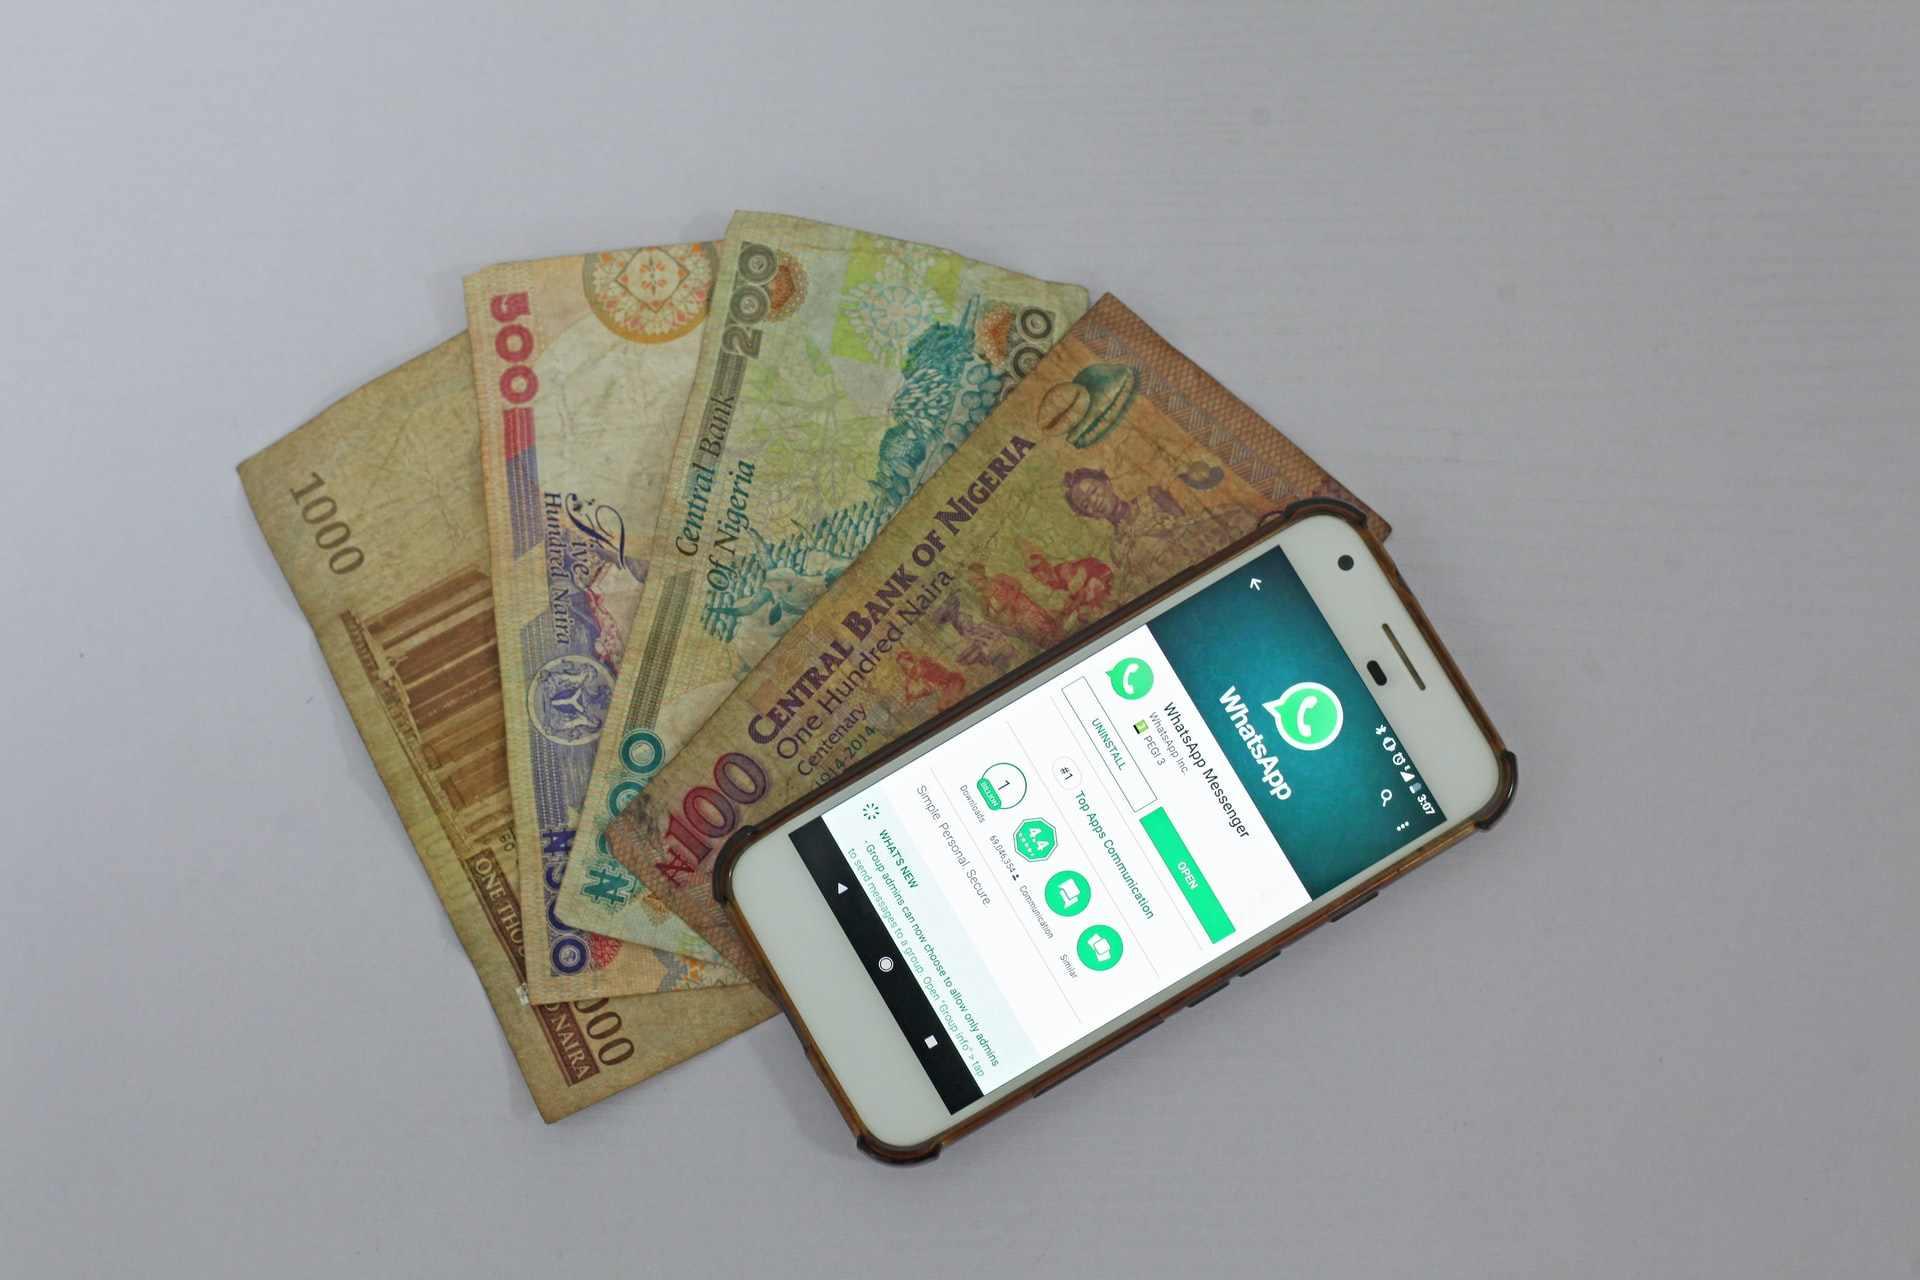 Cara Membaca Kembali Pesan yang Dihapus pada WhatsApp, Baca Pesan WhatsApp yang Sudah Dihapus